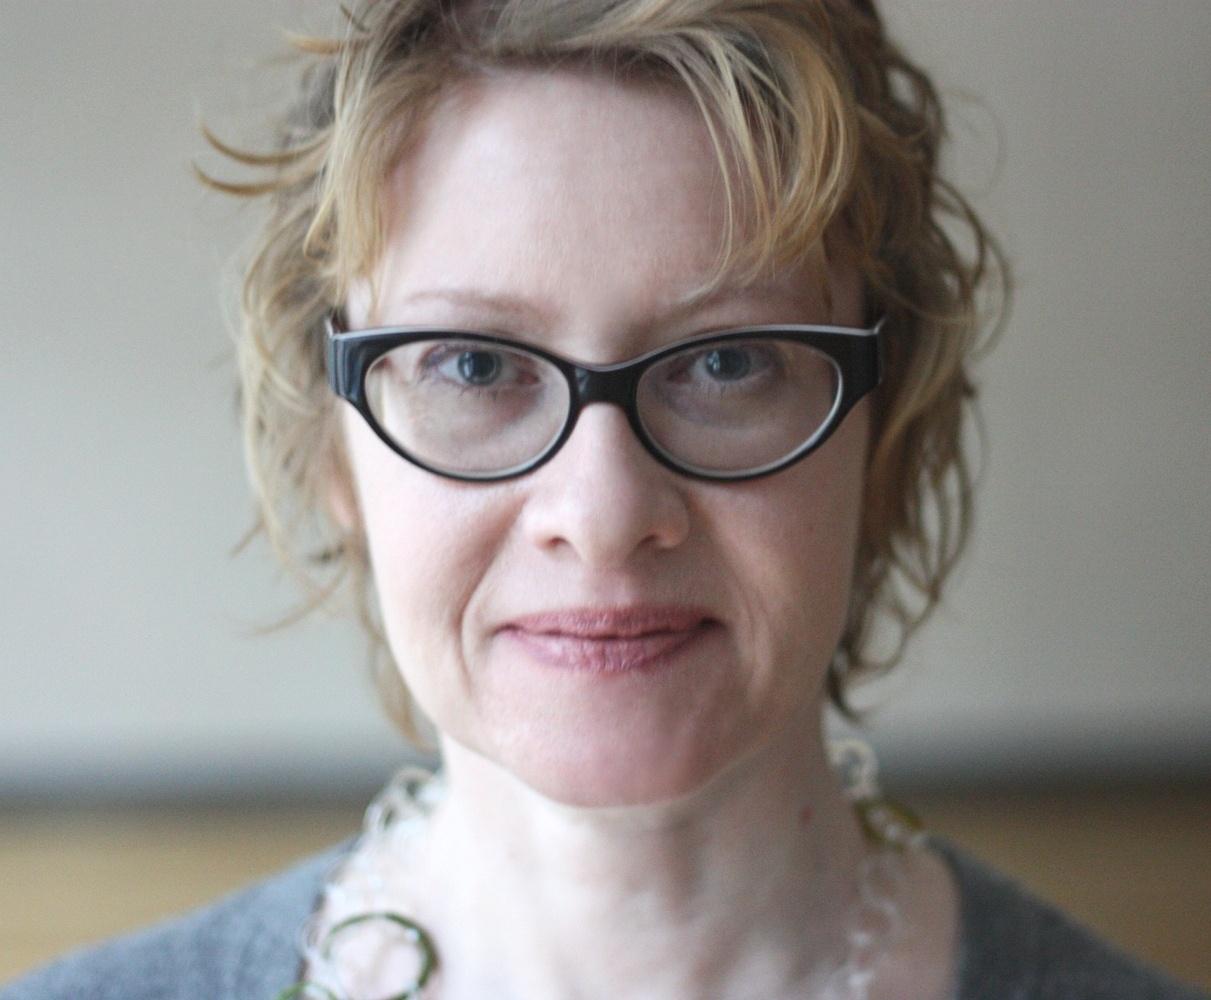 Interview with Maryann of the Kindergarten Mind